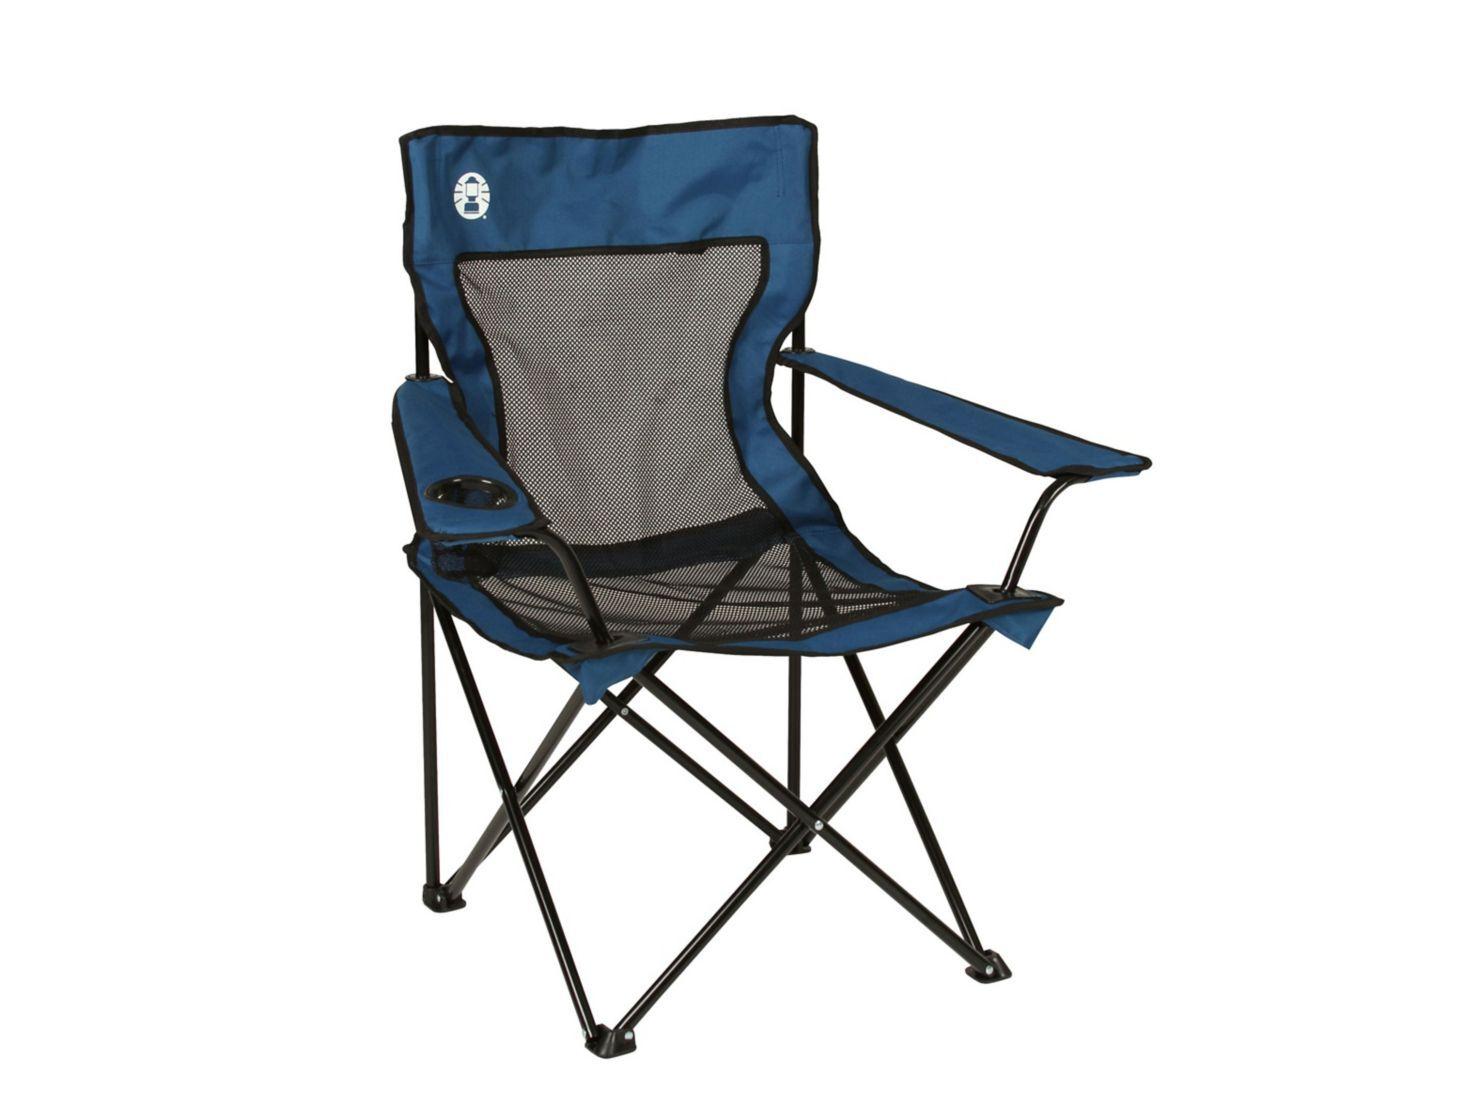 Silla Plegable Coleman Quad Azul - Sillas y Mesas Plegables  73495fc3cdf9